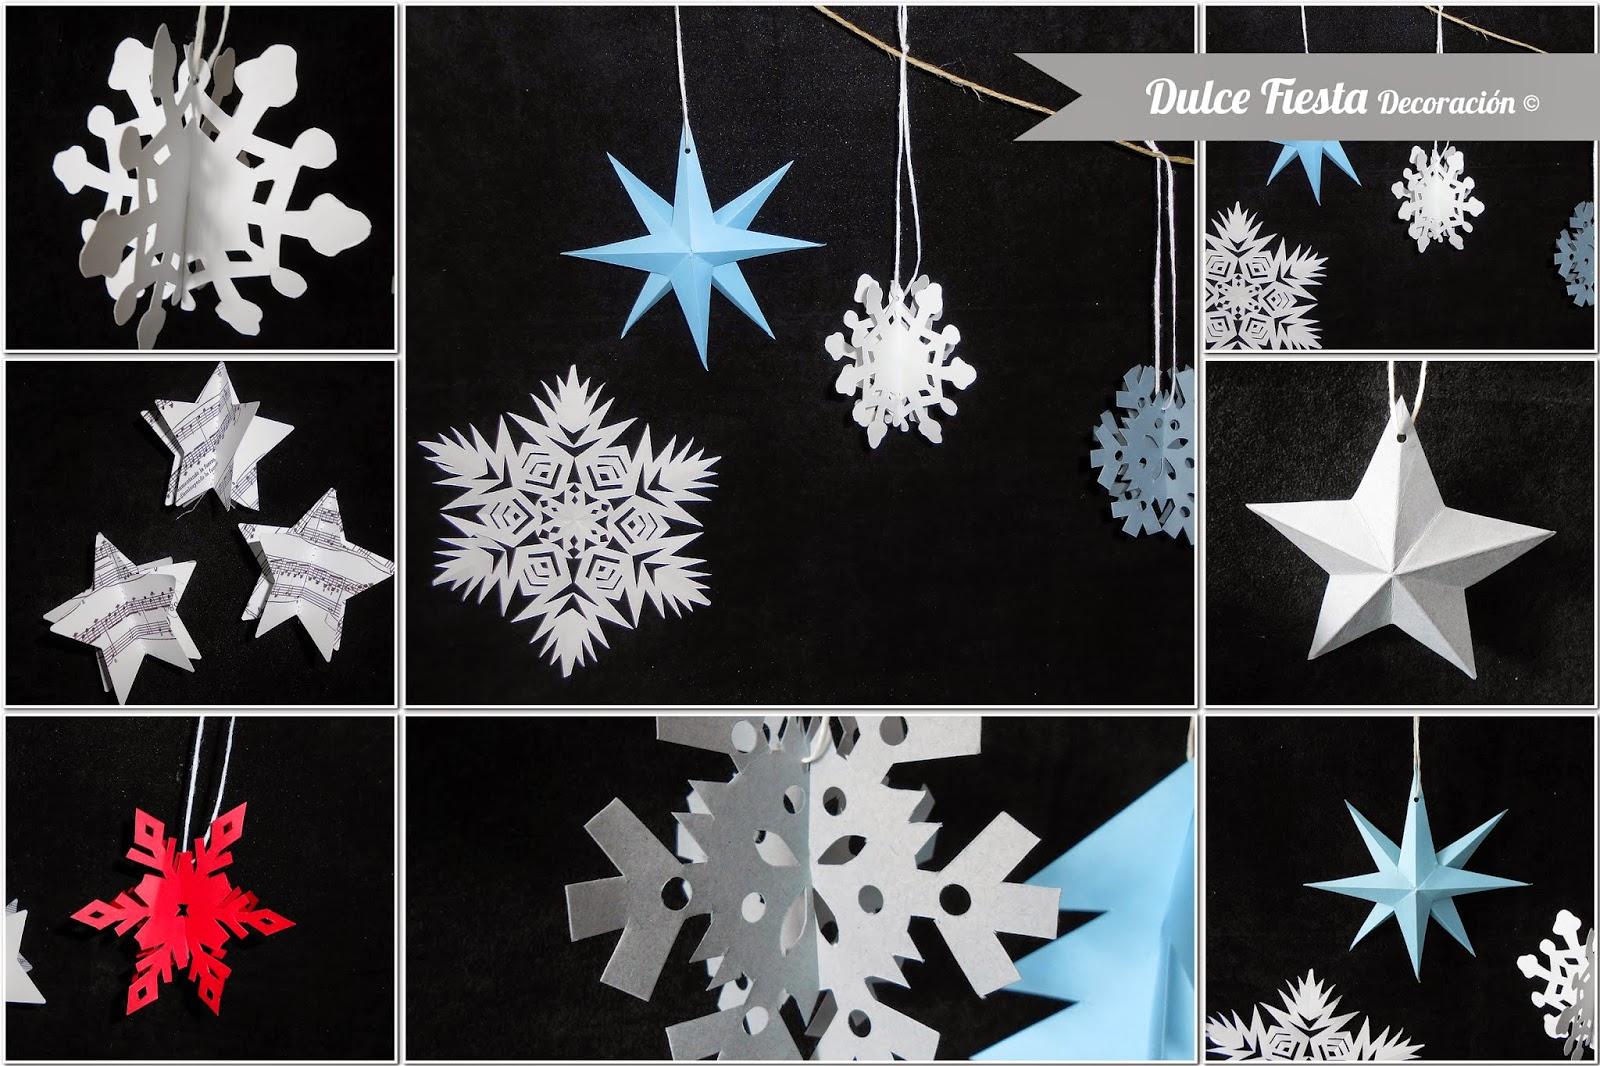 Dise o y decoraci n personalizada para eventos siete for Adornos navidenos origami paso a paso